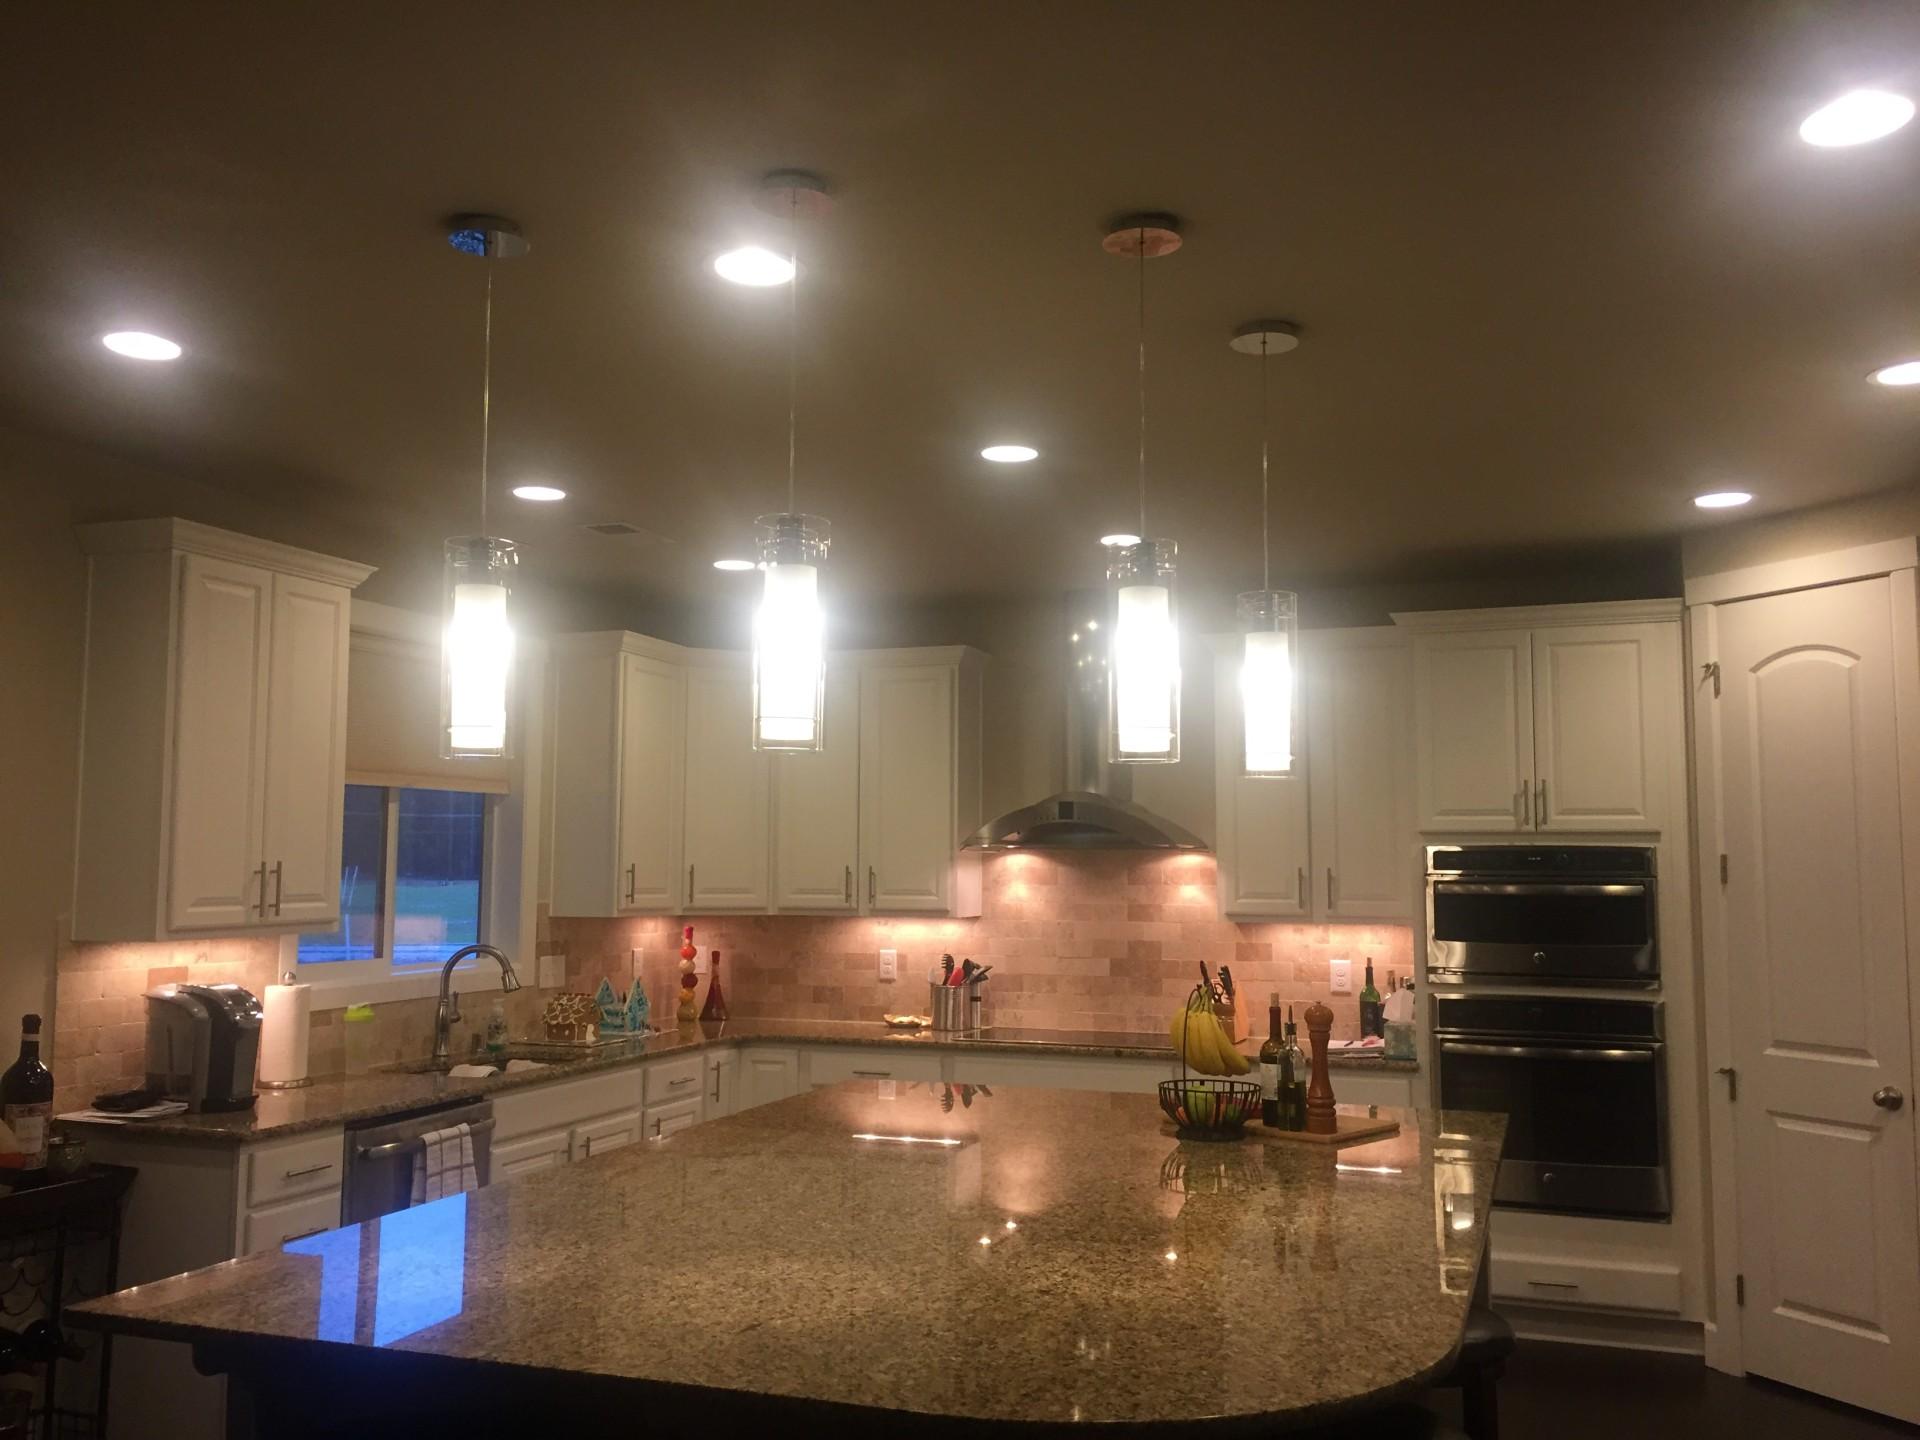 under cabinet lights, beautiful kitchen lights, pendant lights, recessed lighting, granite counter tops, kitchen island, white cabinets, huge kitchen, big kitchen